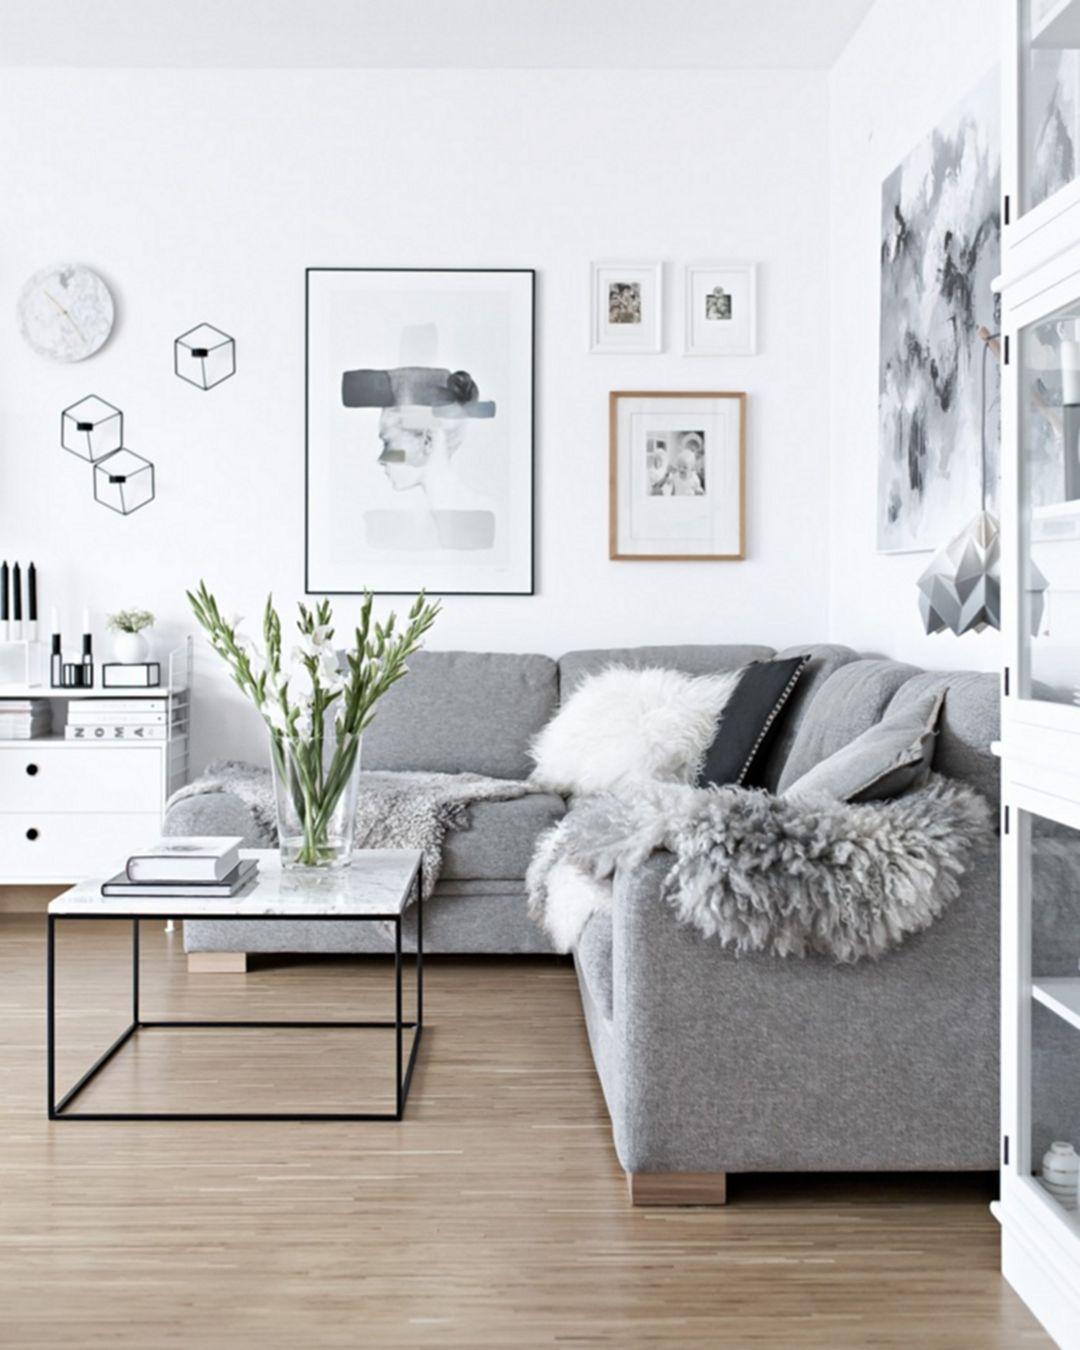 Livingroomideas Coleccion De Muebles Diseno De Interiores De Salon Sofas Grises